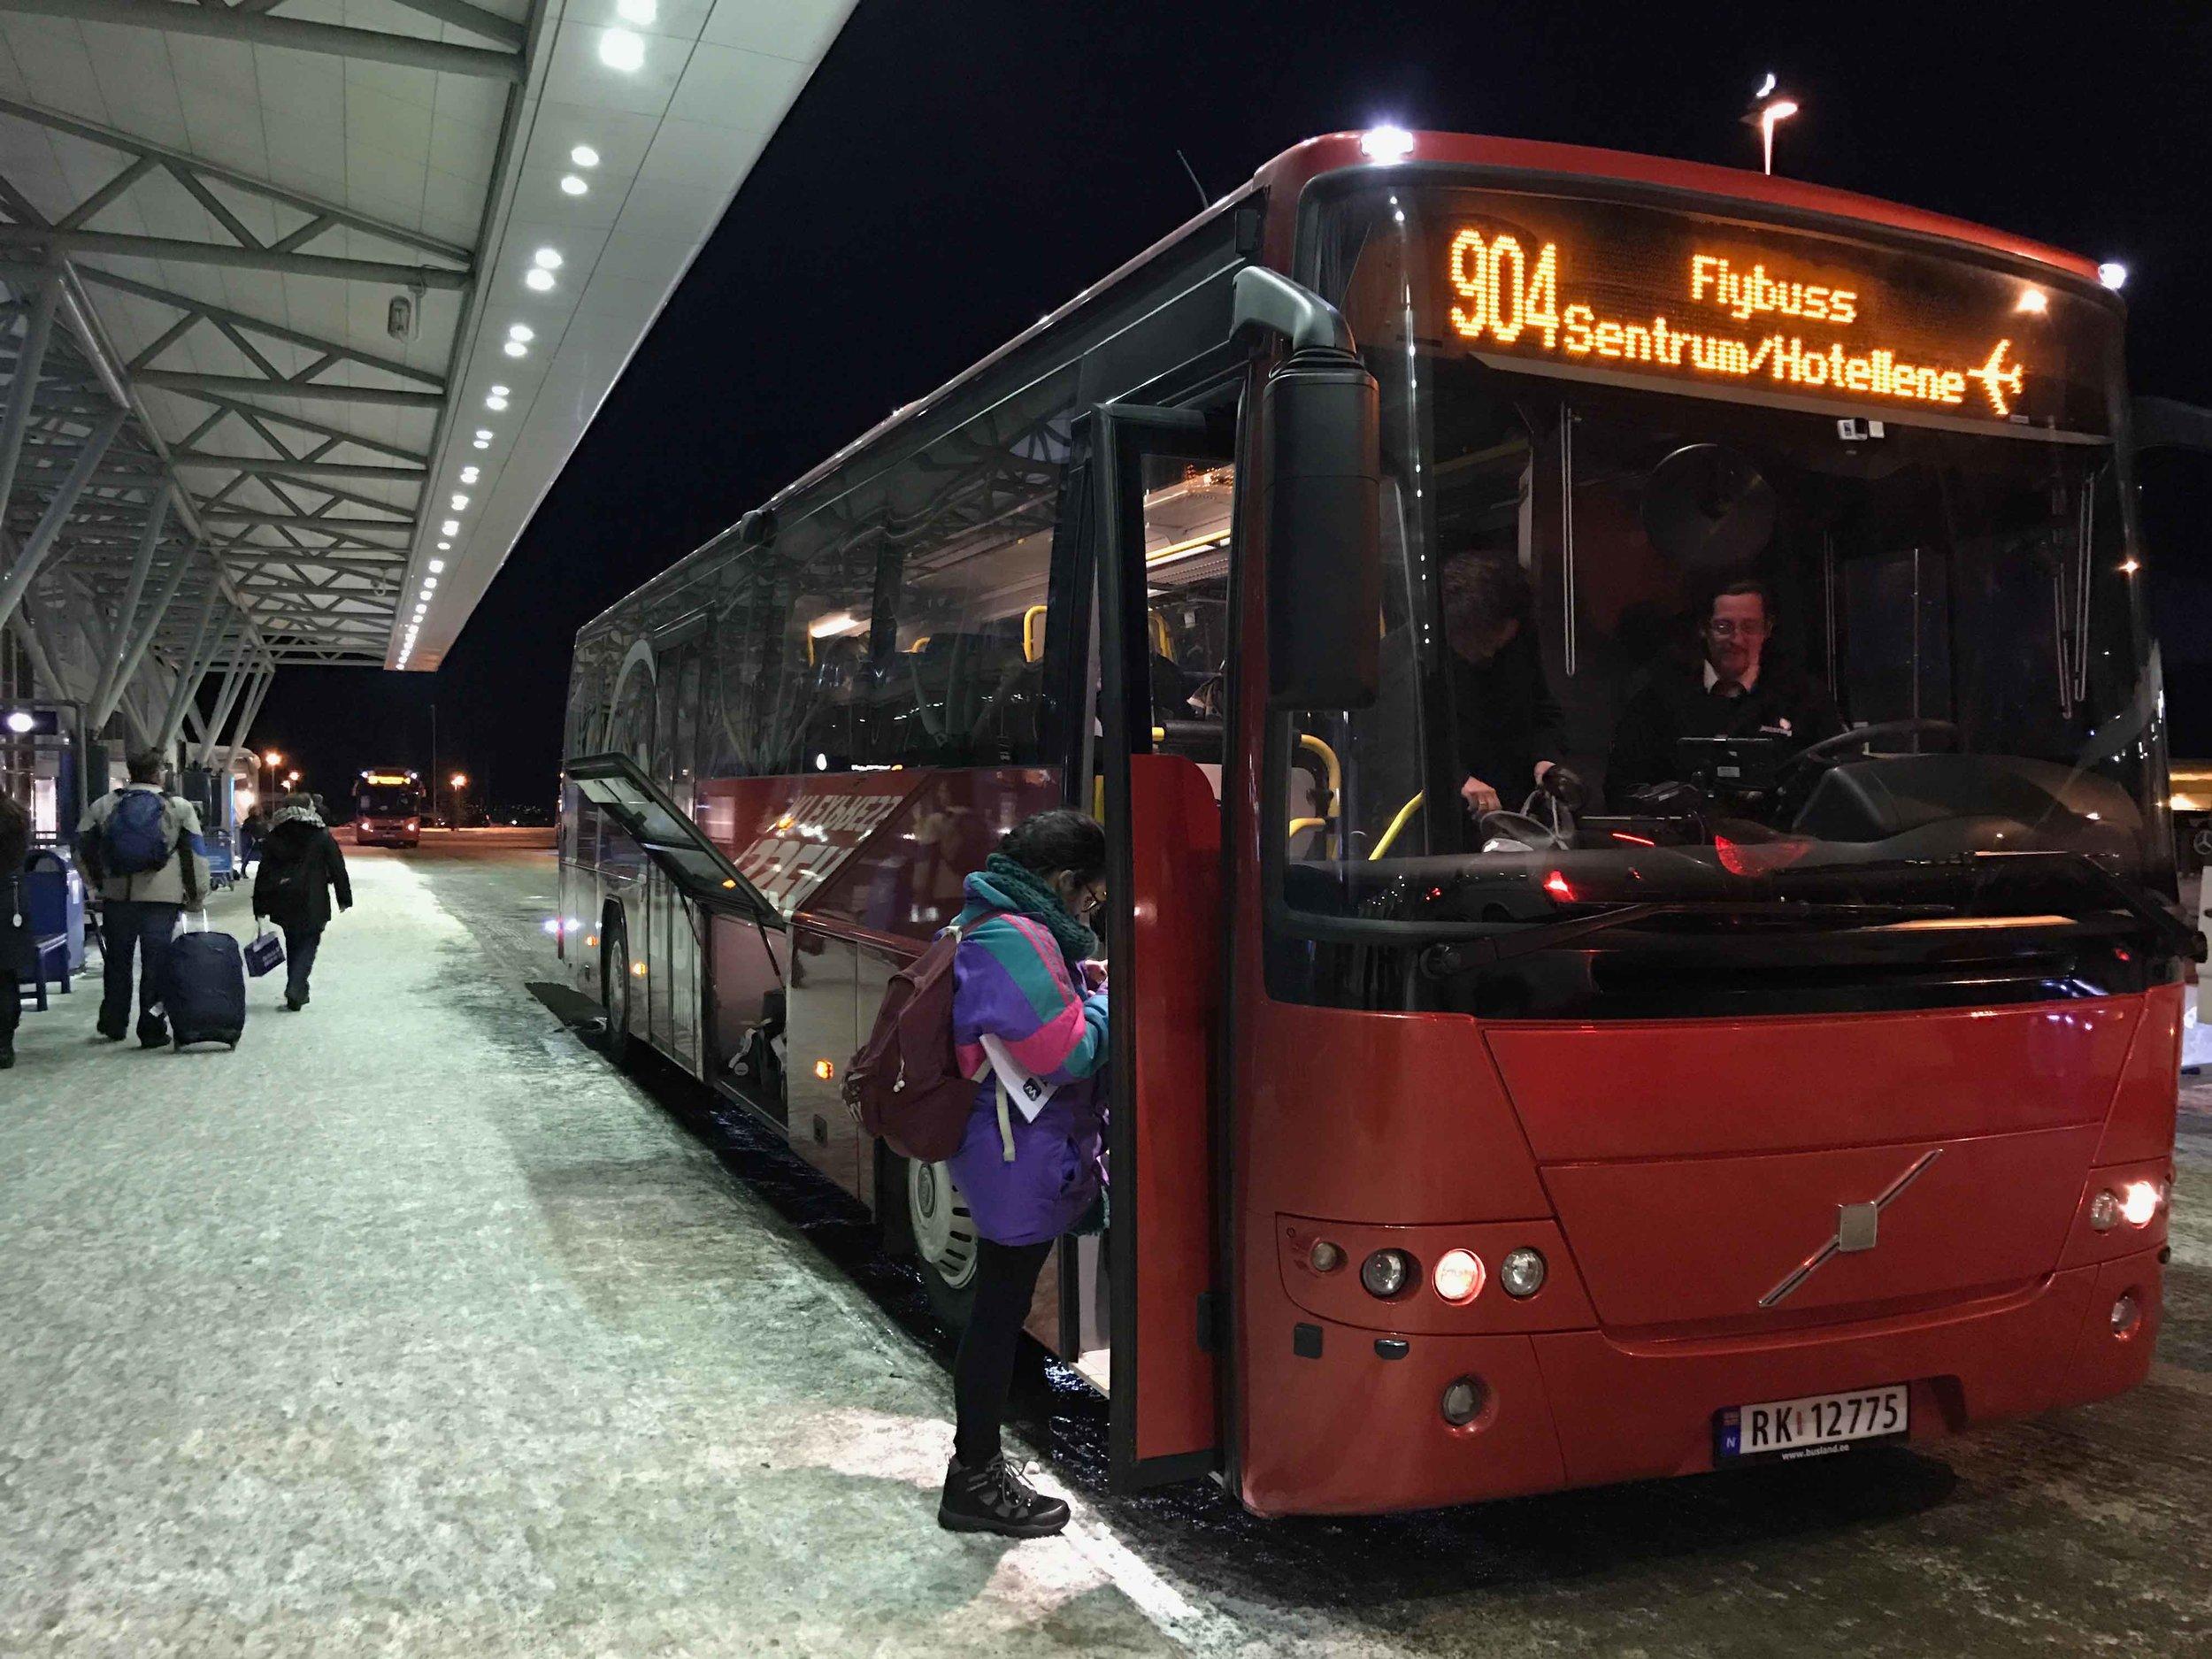 Tromso Airport Shuttle, Flybuss, Tromso airport, Langnes, Norway. Image©thingstodot.com